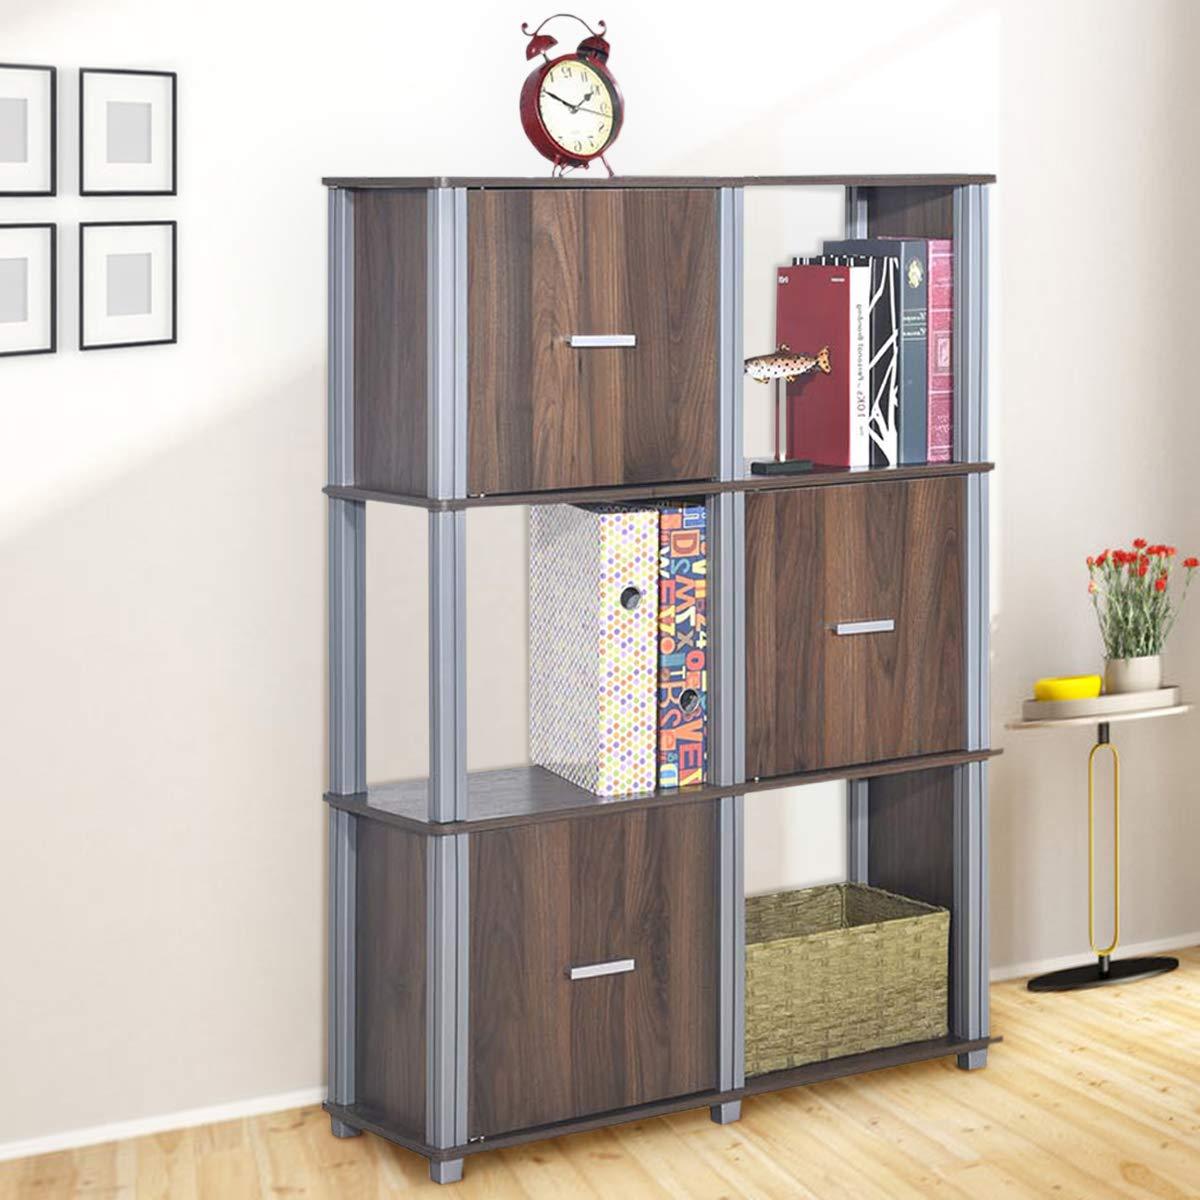 Tangkula Storage Shelf 3-Tier Utility Shelf Multifunctional Storage Cabinet Organizer Rack Display Stand Bookcase Bookshelf Walnut